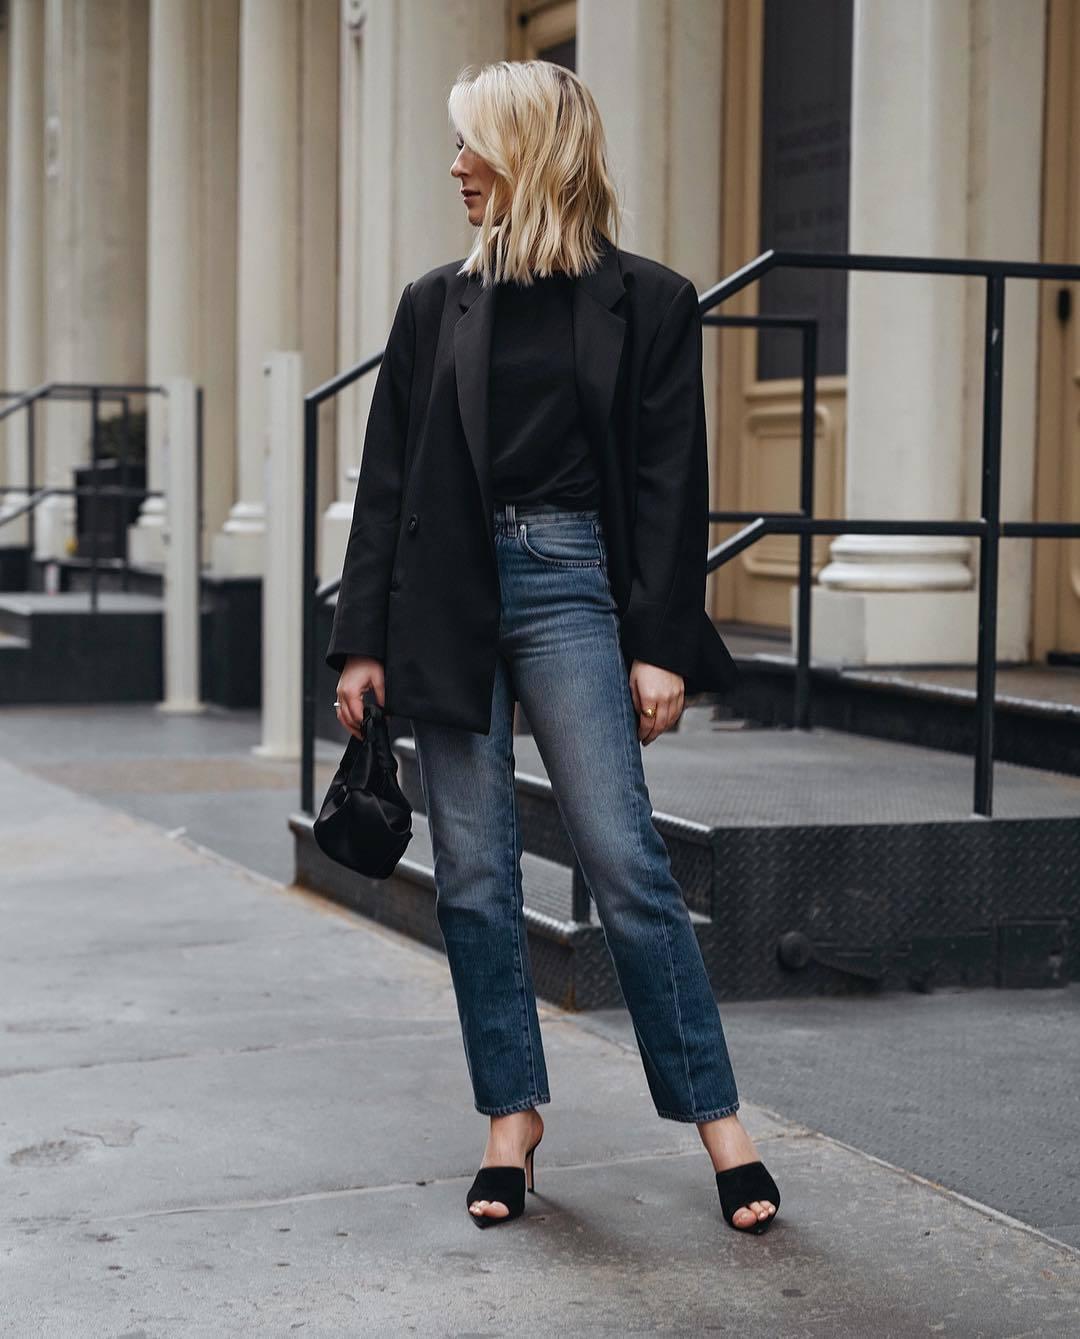 jacket black blazer double breasted oversized black sandals straight jeans high waisted jeans black t-shirt black bag